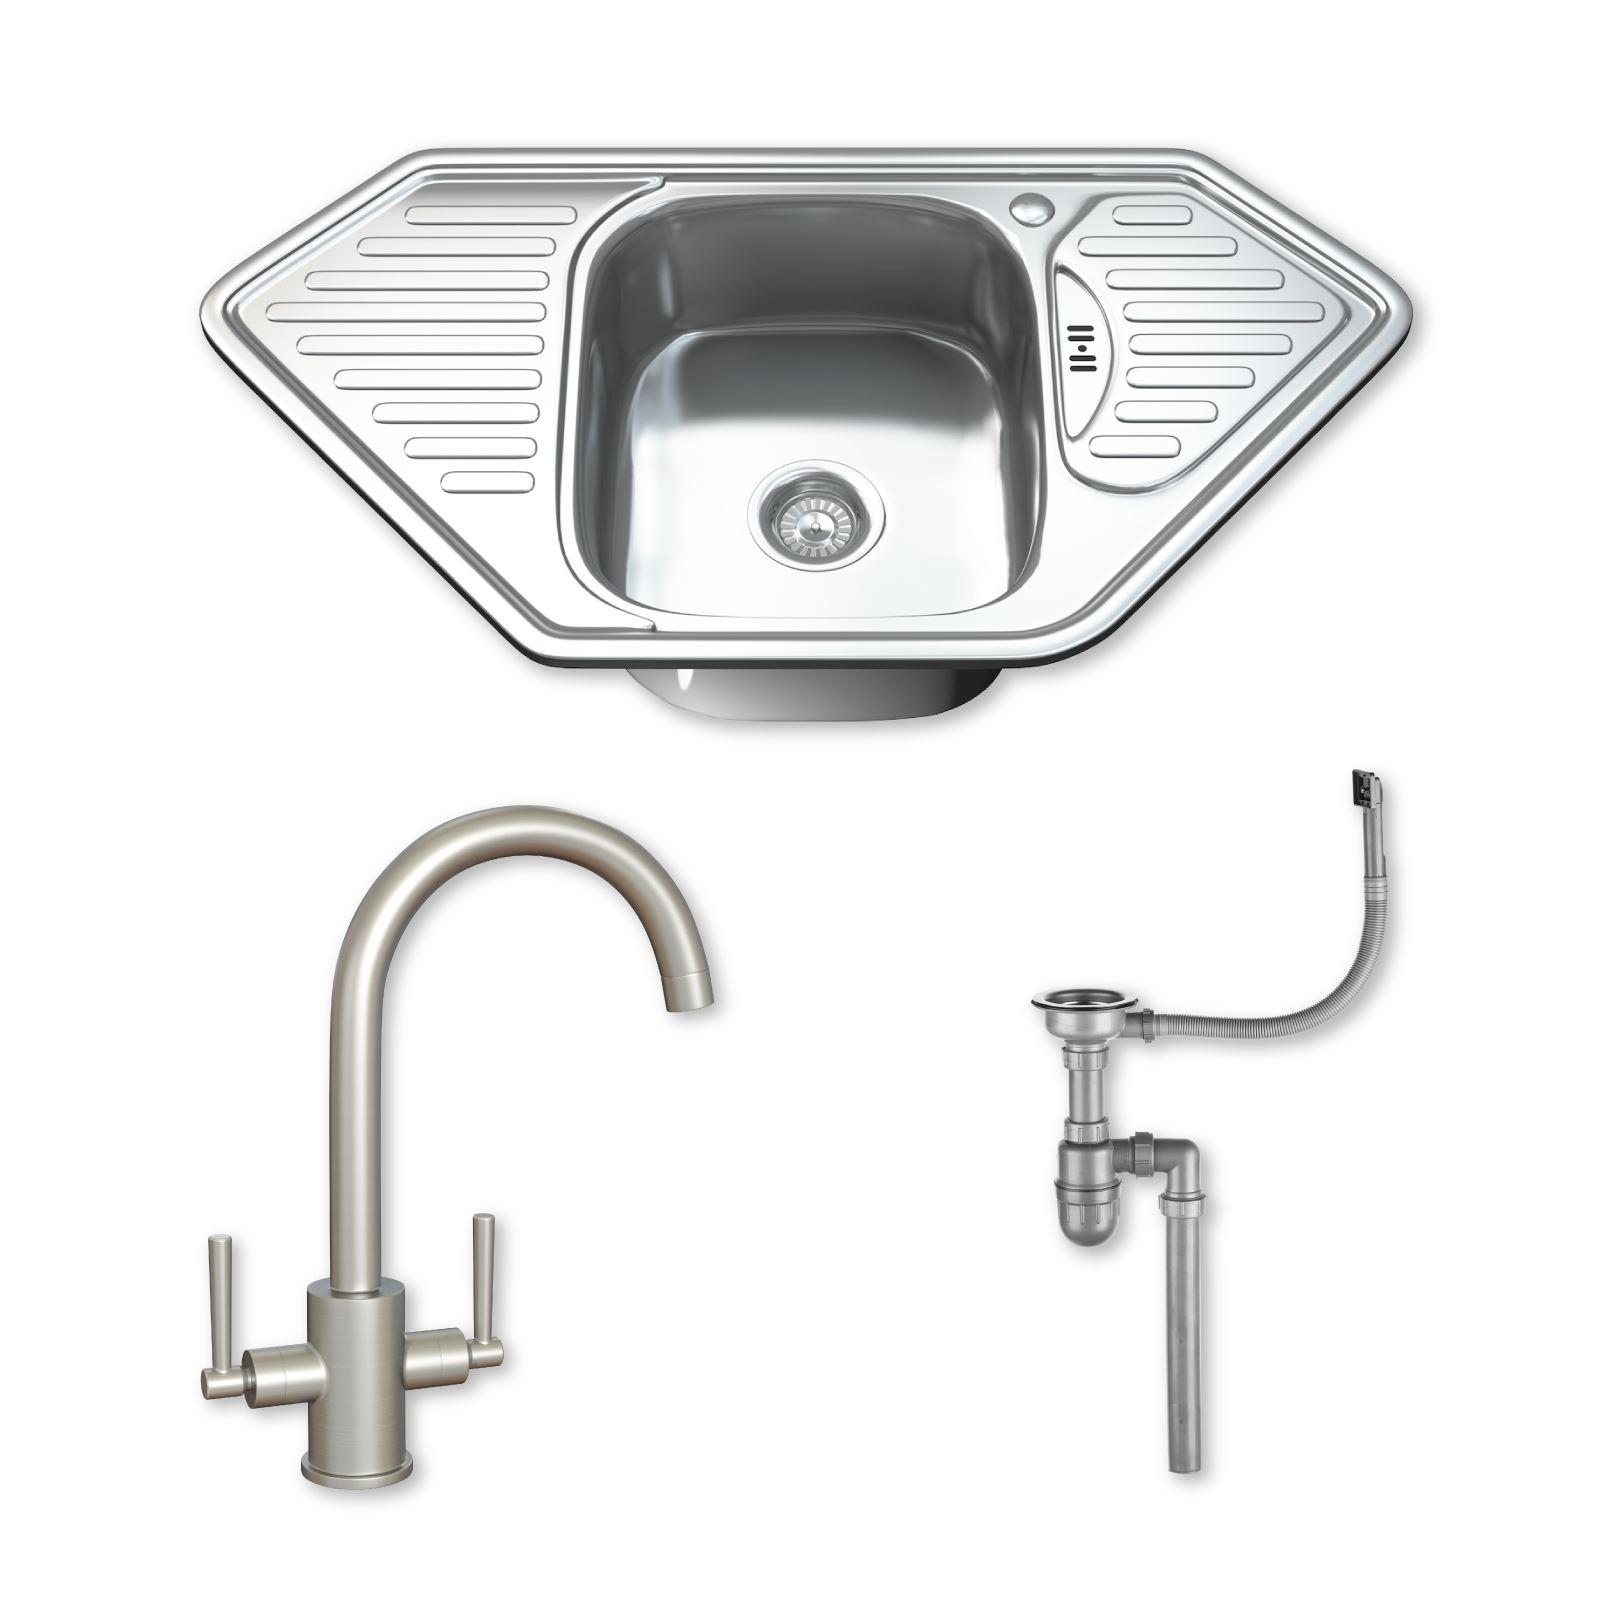 stainless steel single bowl kitchen sink planner software 1 corner tap